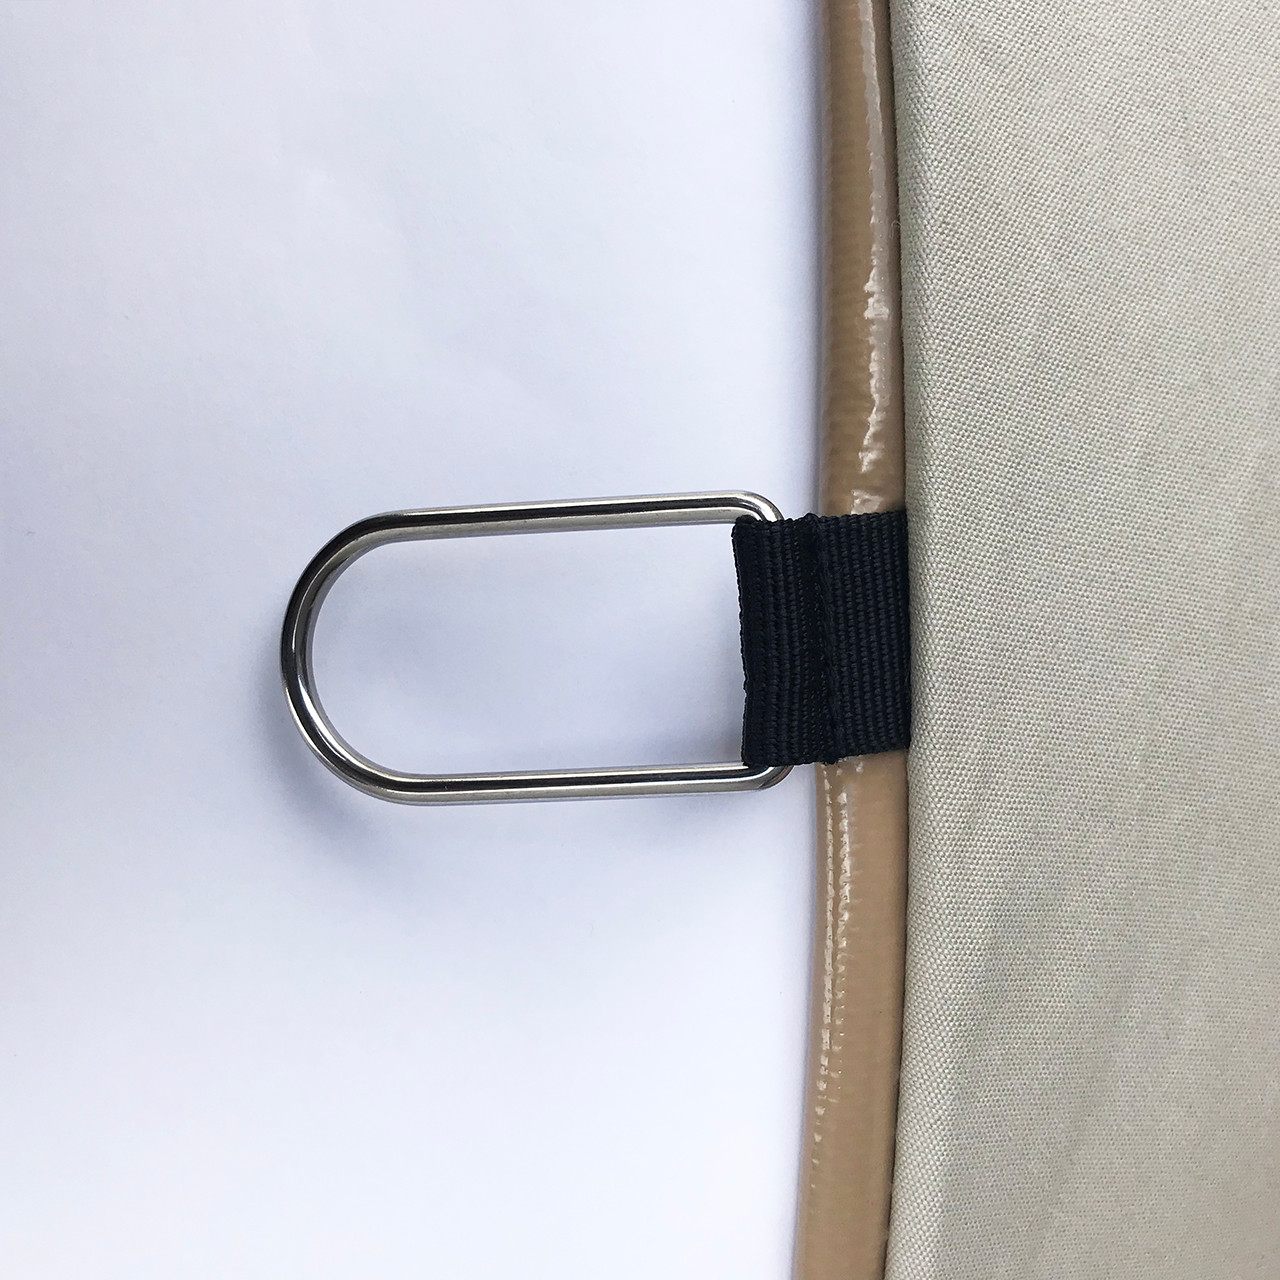 10 x 14 ft. Flex-Bow VX Tent - Estimated Restock Date Jul. 1st, 2021